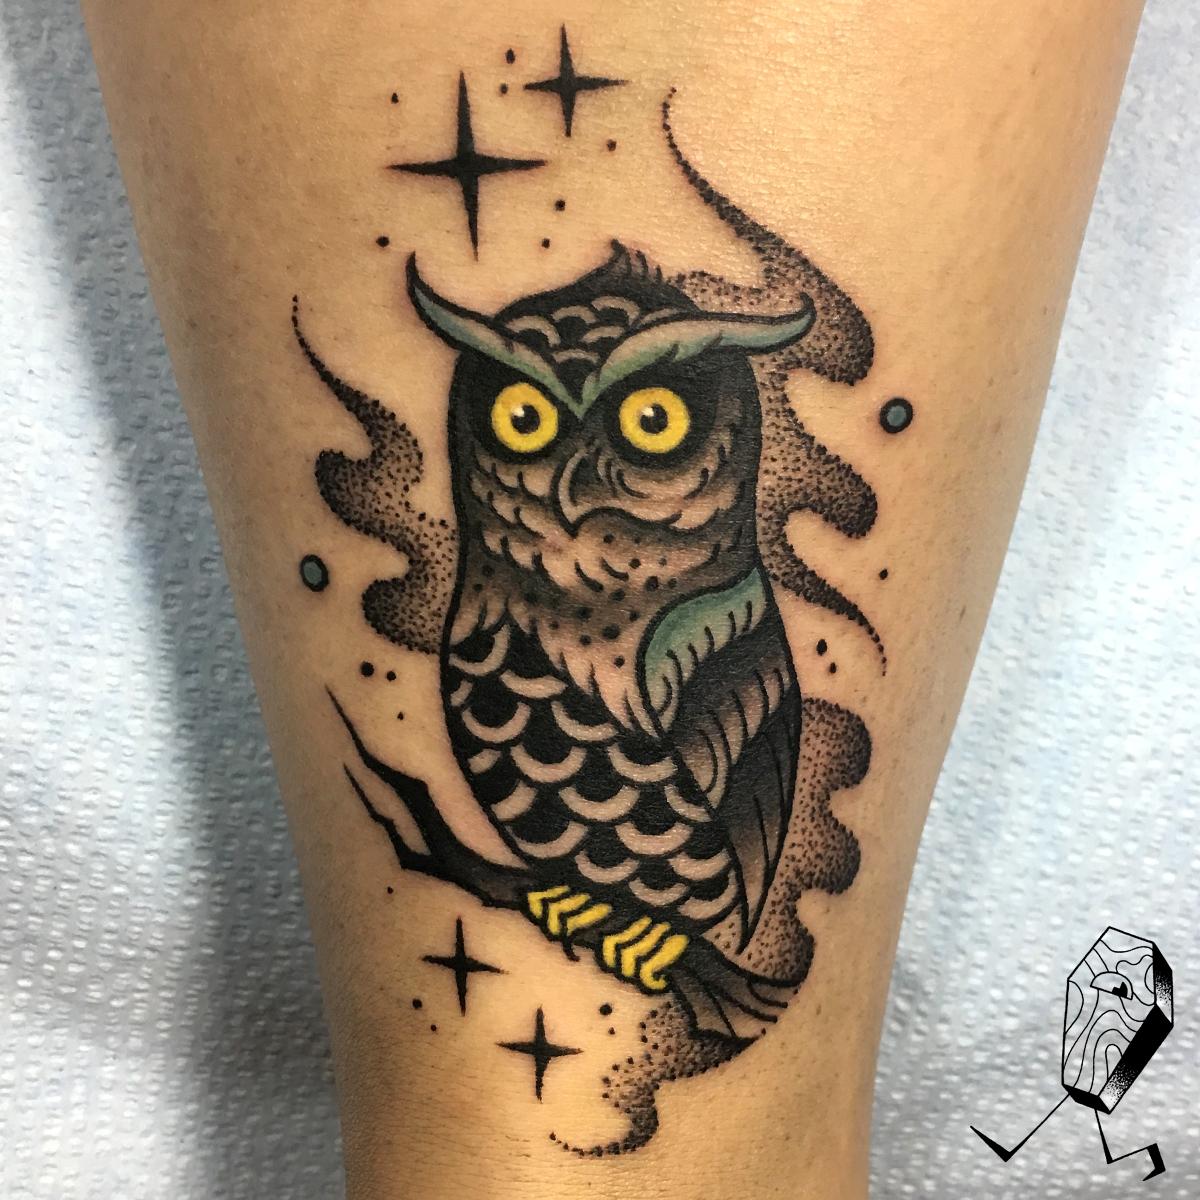 nicole-ankle-owl-dedleg-tattoo.jpg